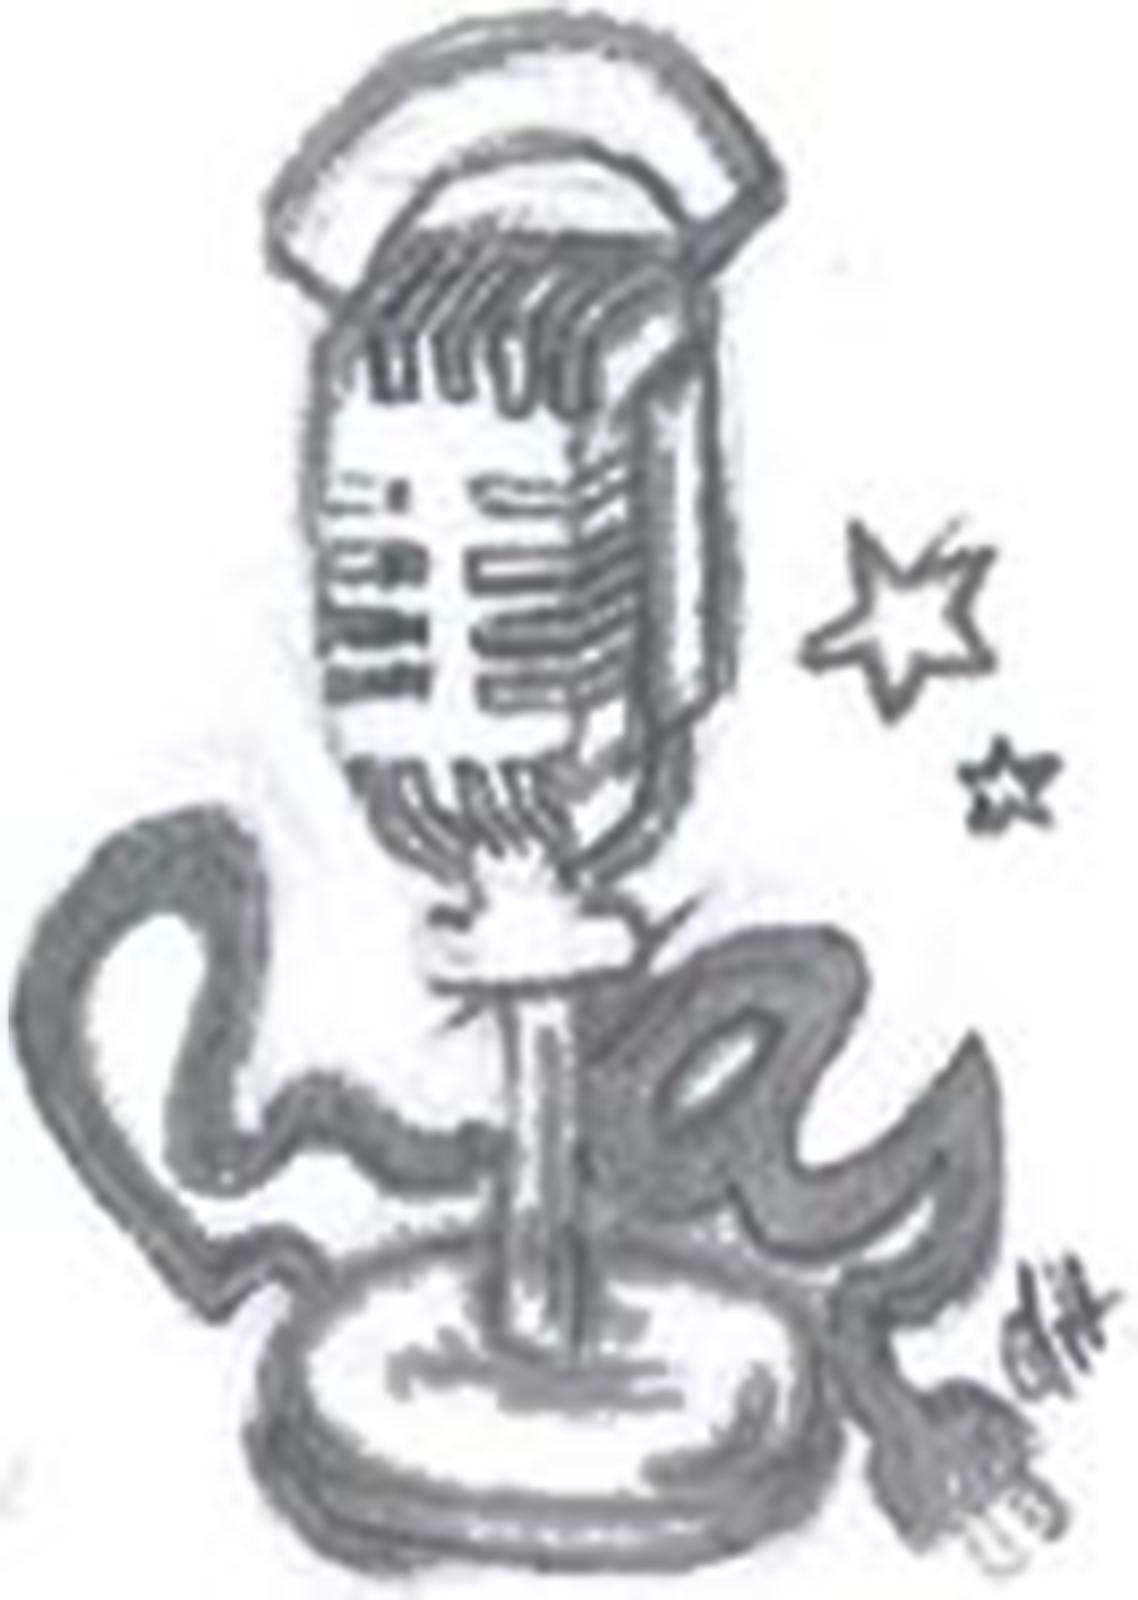 Radio Ras